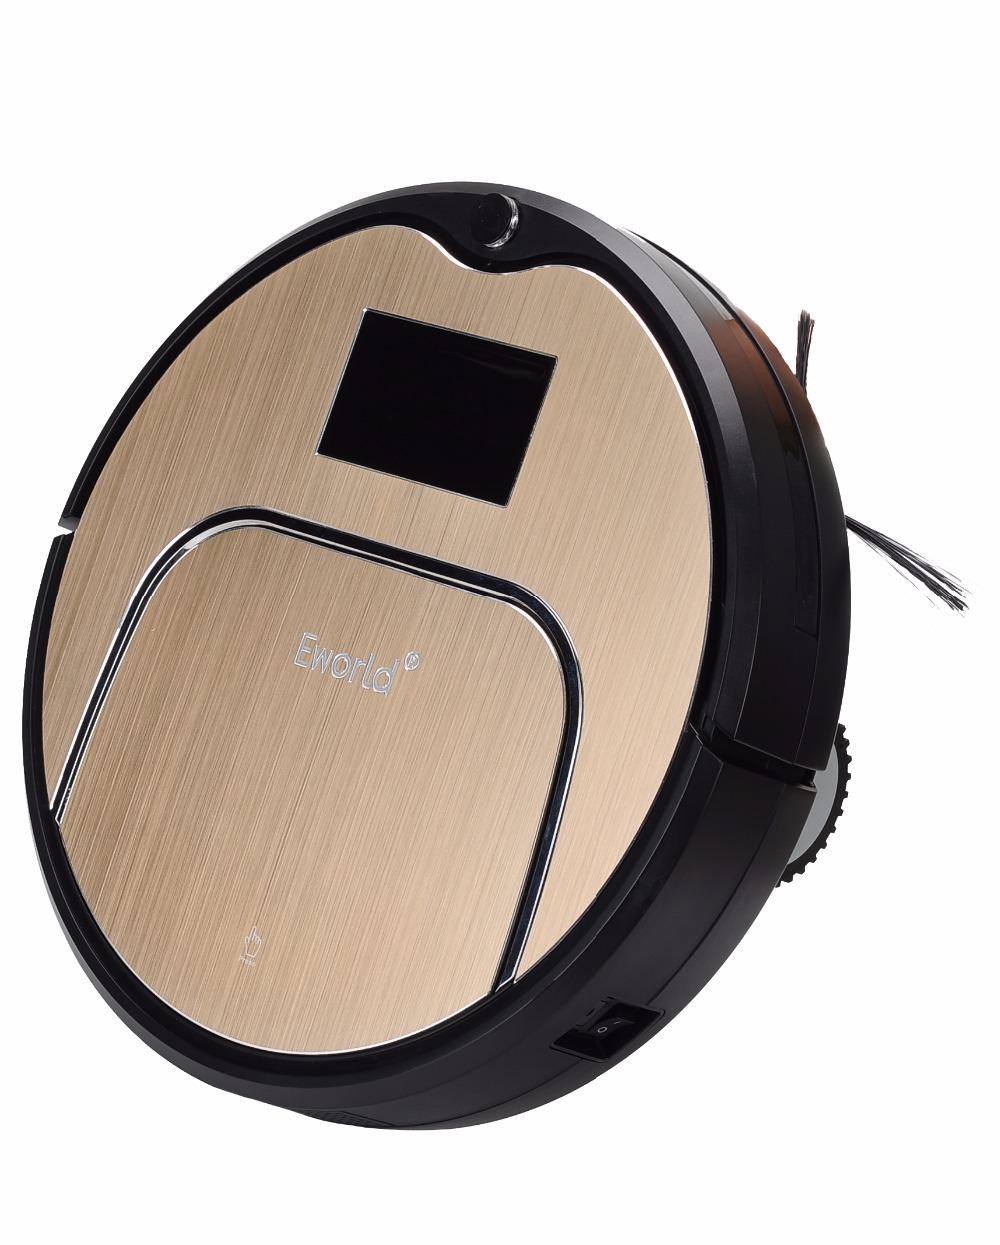 Eworld Mop Robot Vacuum Cleaner for Home, M883 Golden lid HEPA Filter Sensor Remote Control Self Charge ROBOT ASPIRADOR For Home(China (Mainland))